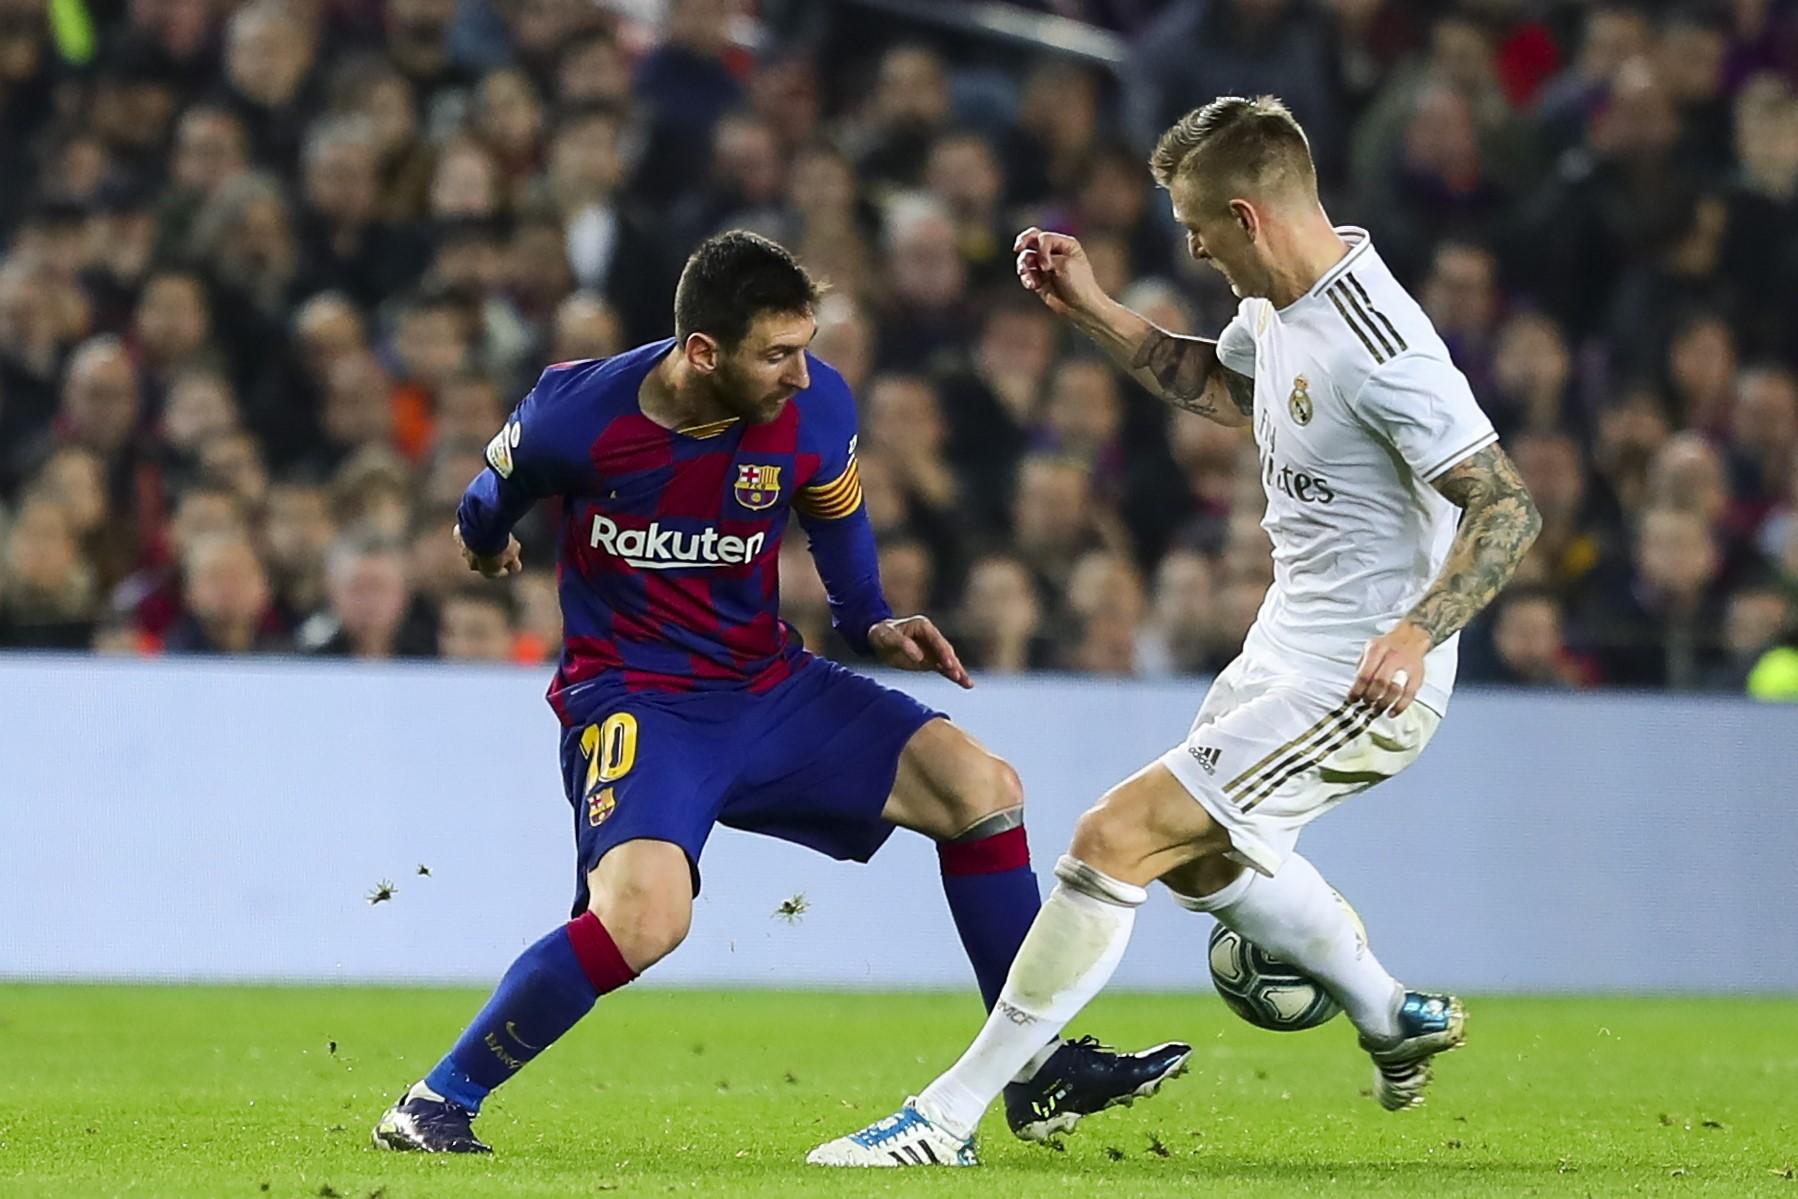 FC Barcelona v Real Madrid: La Liga